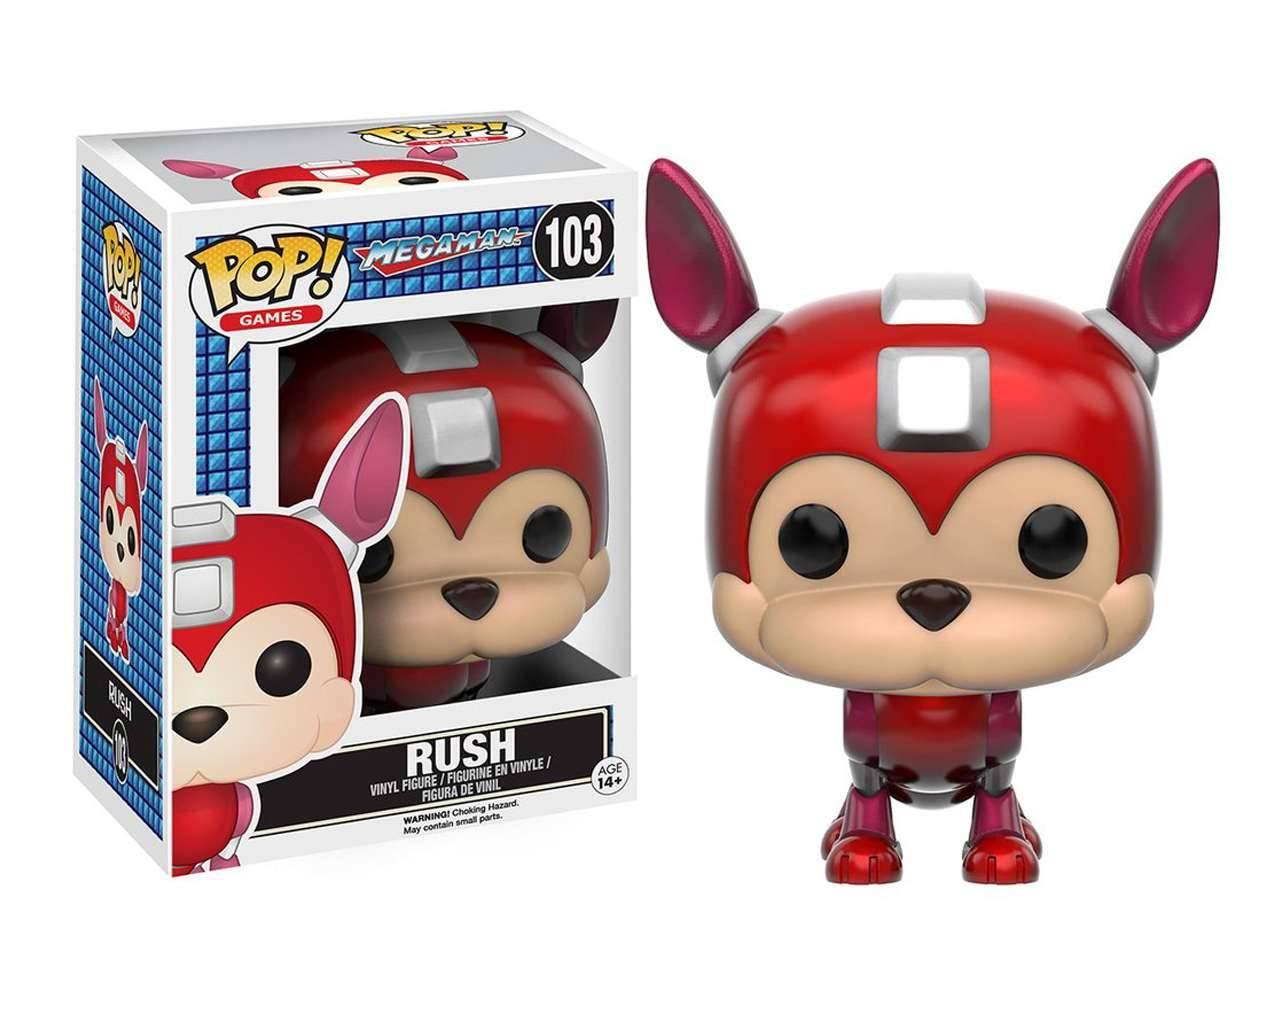 Rush Pop! Vinyl